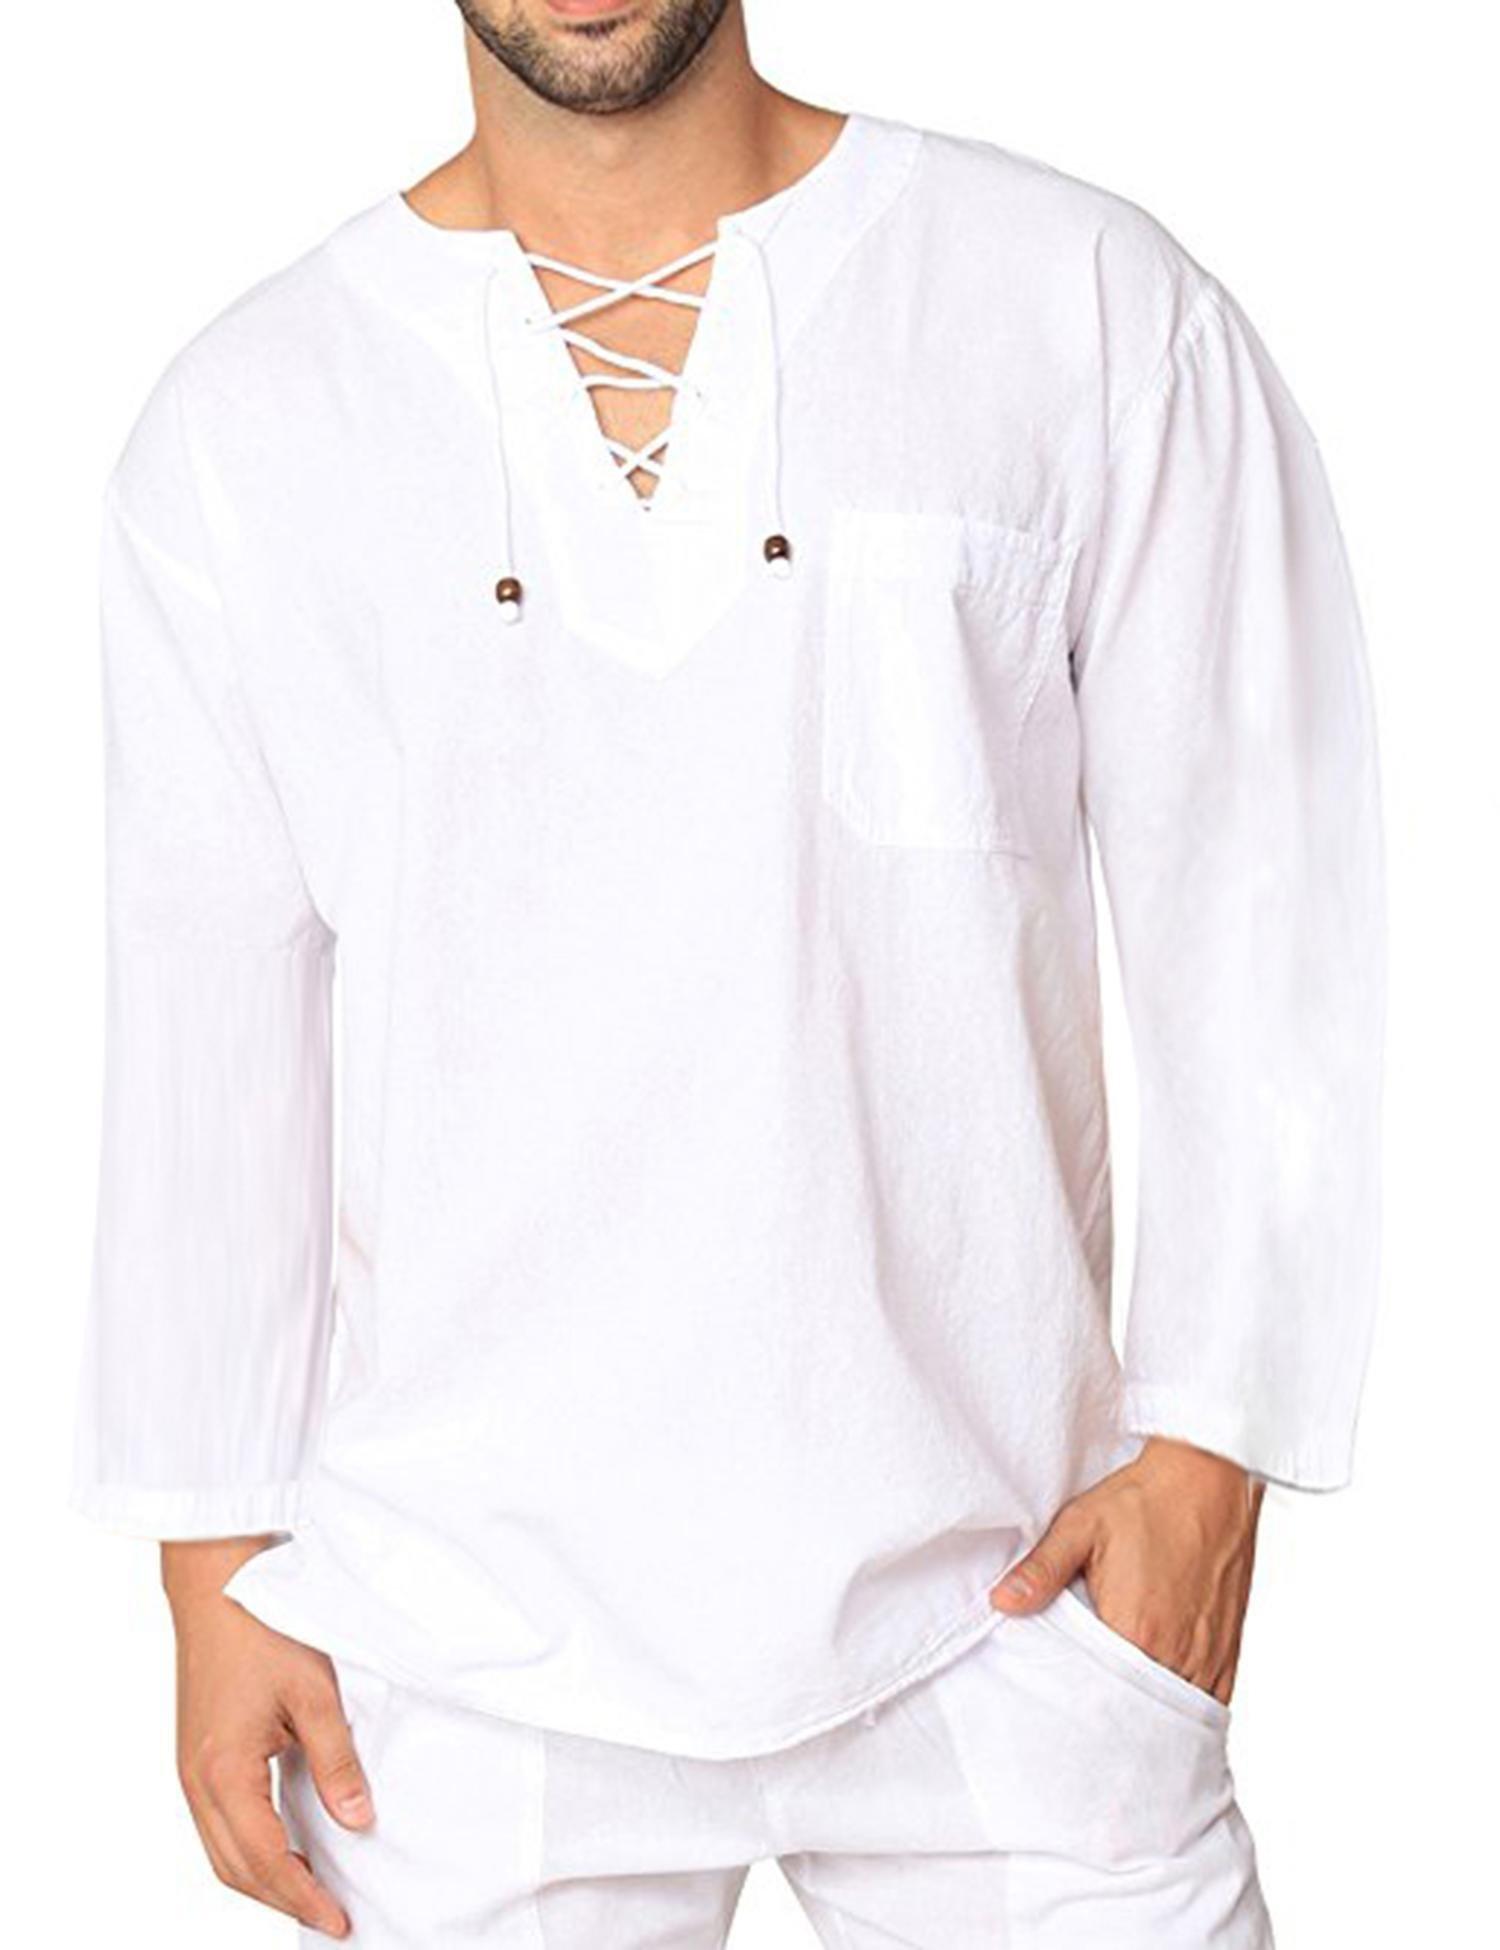 COOFANDY Mens Fashion T Shirt Cotton Tee Hippie Shirts Long Sleeve Yoga Top,White,Large